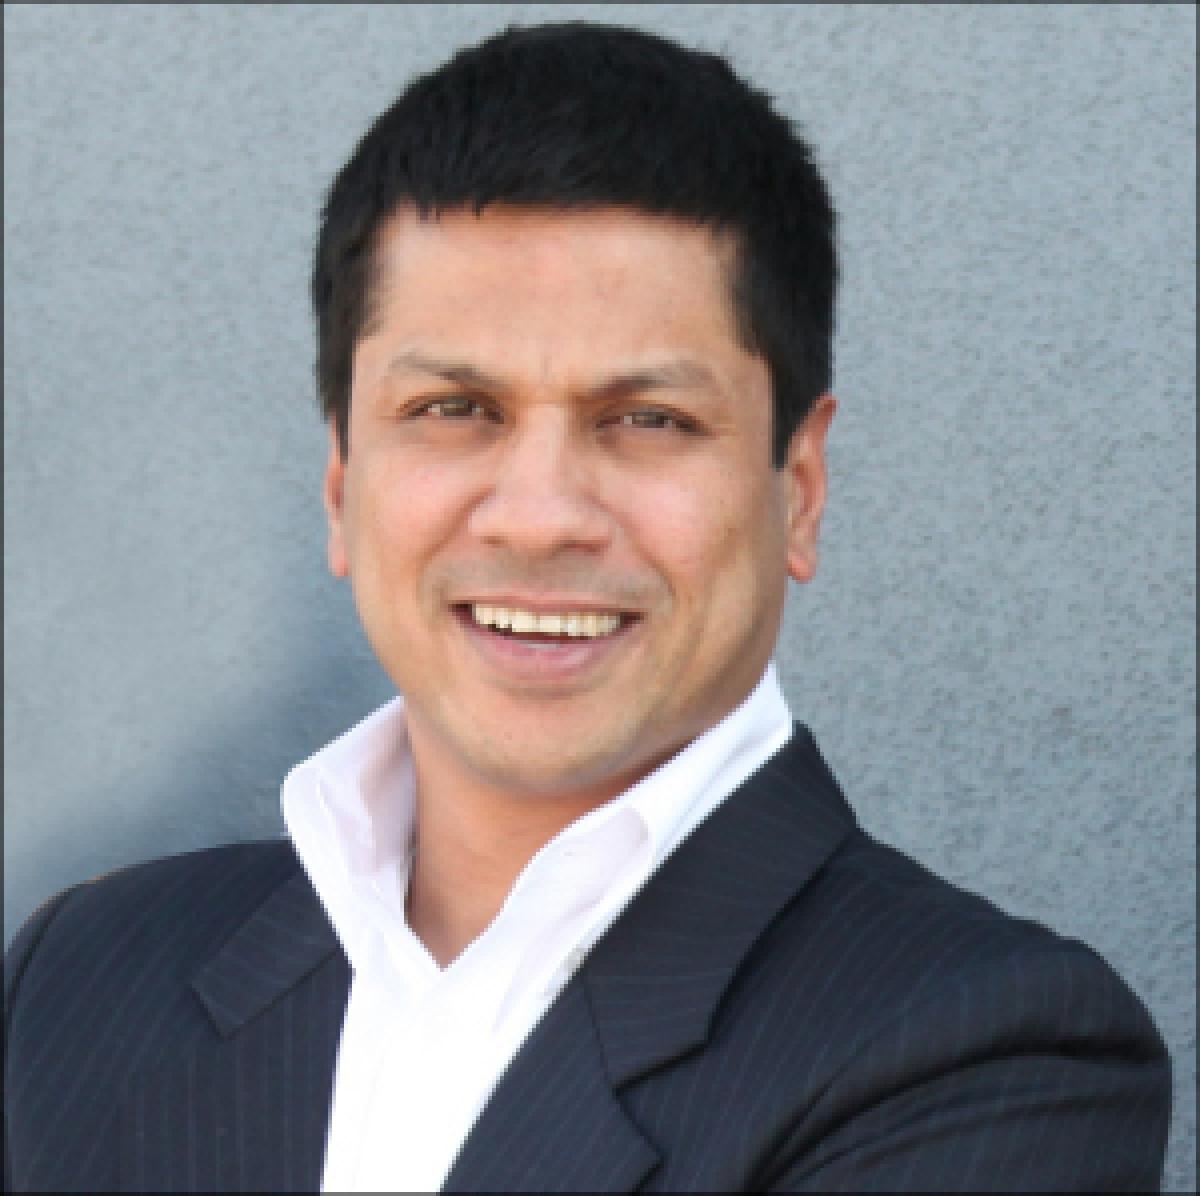 Praveen Kenneth announces retirement from L&K Saatchi & Saatchi